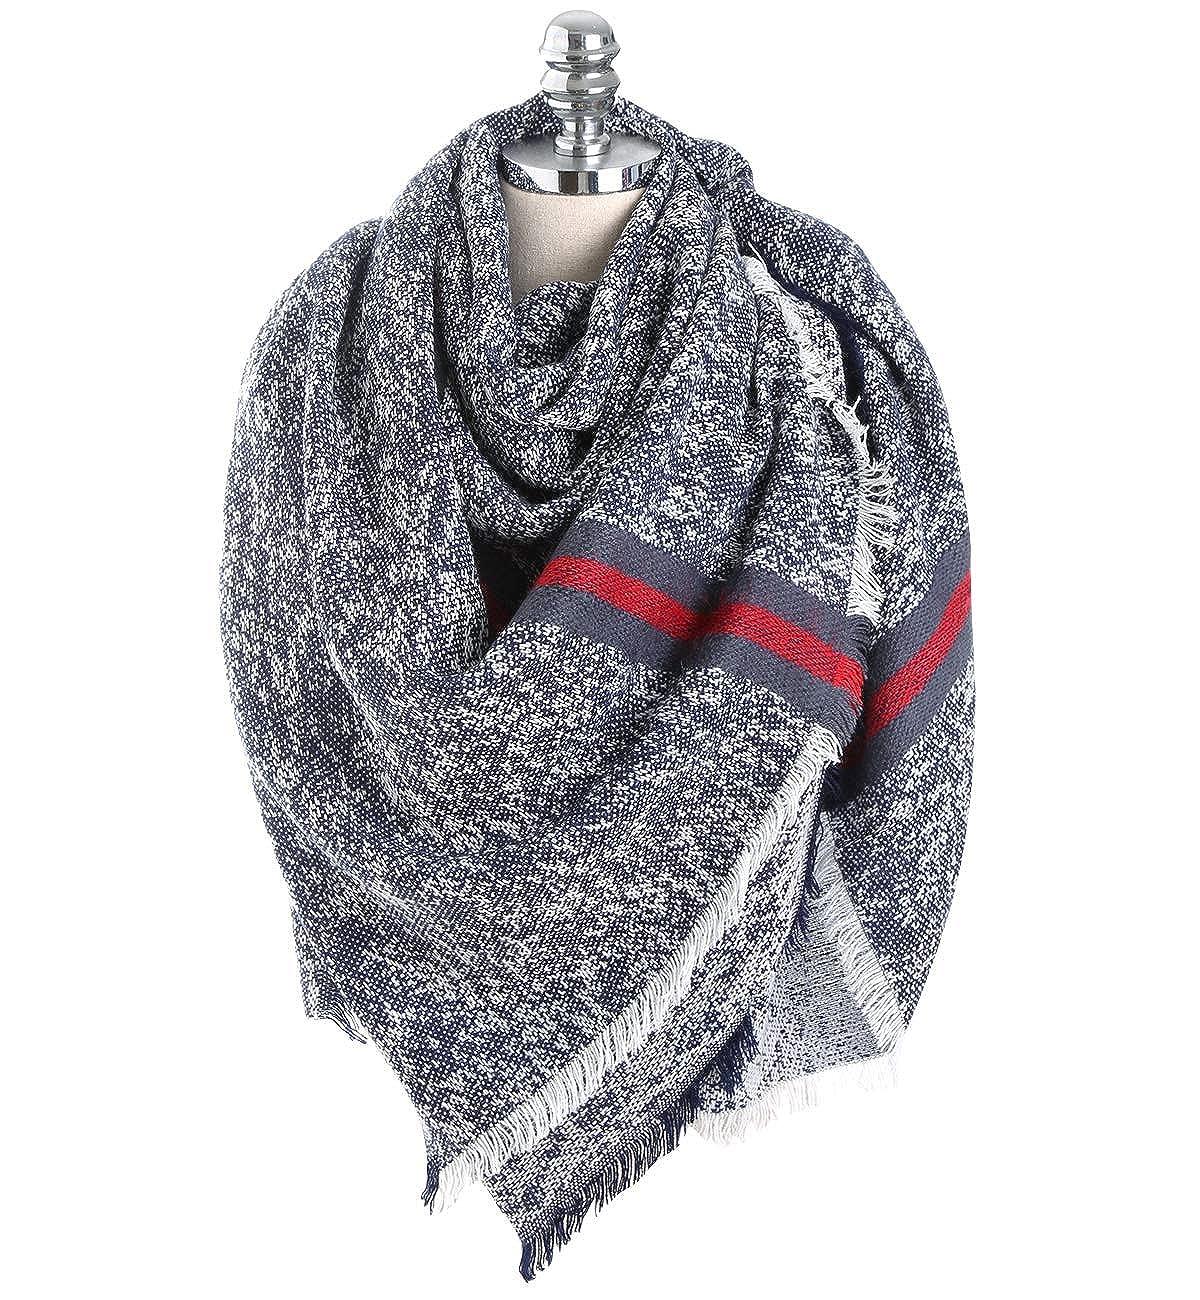 Superora Bufanda para Mujer Invierno Chal Manta Mantón Fular Grande Enorme Larga Cachemira 150 * 130cm